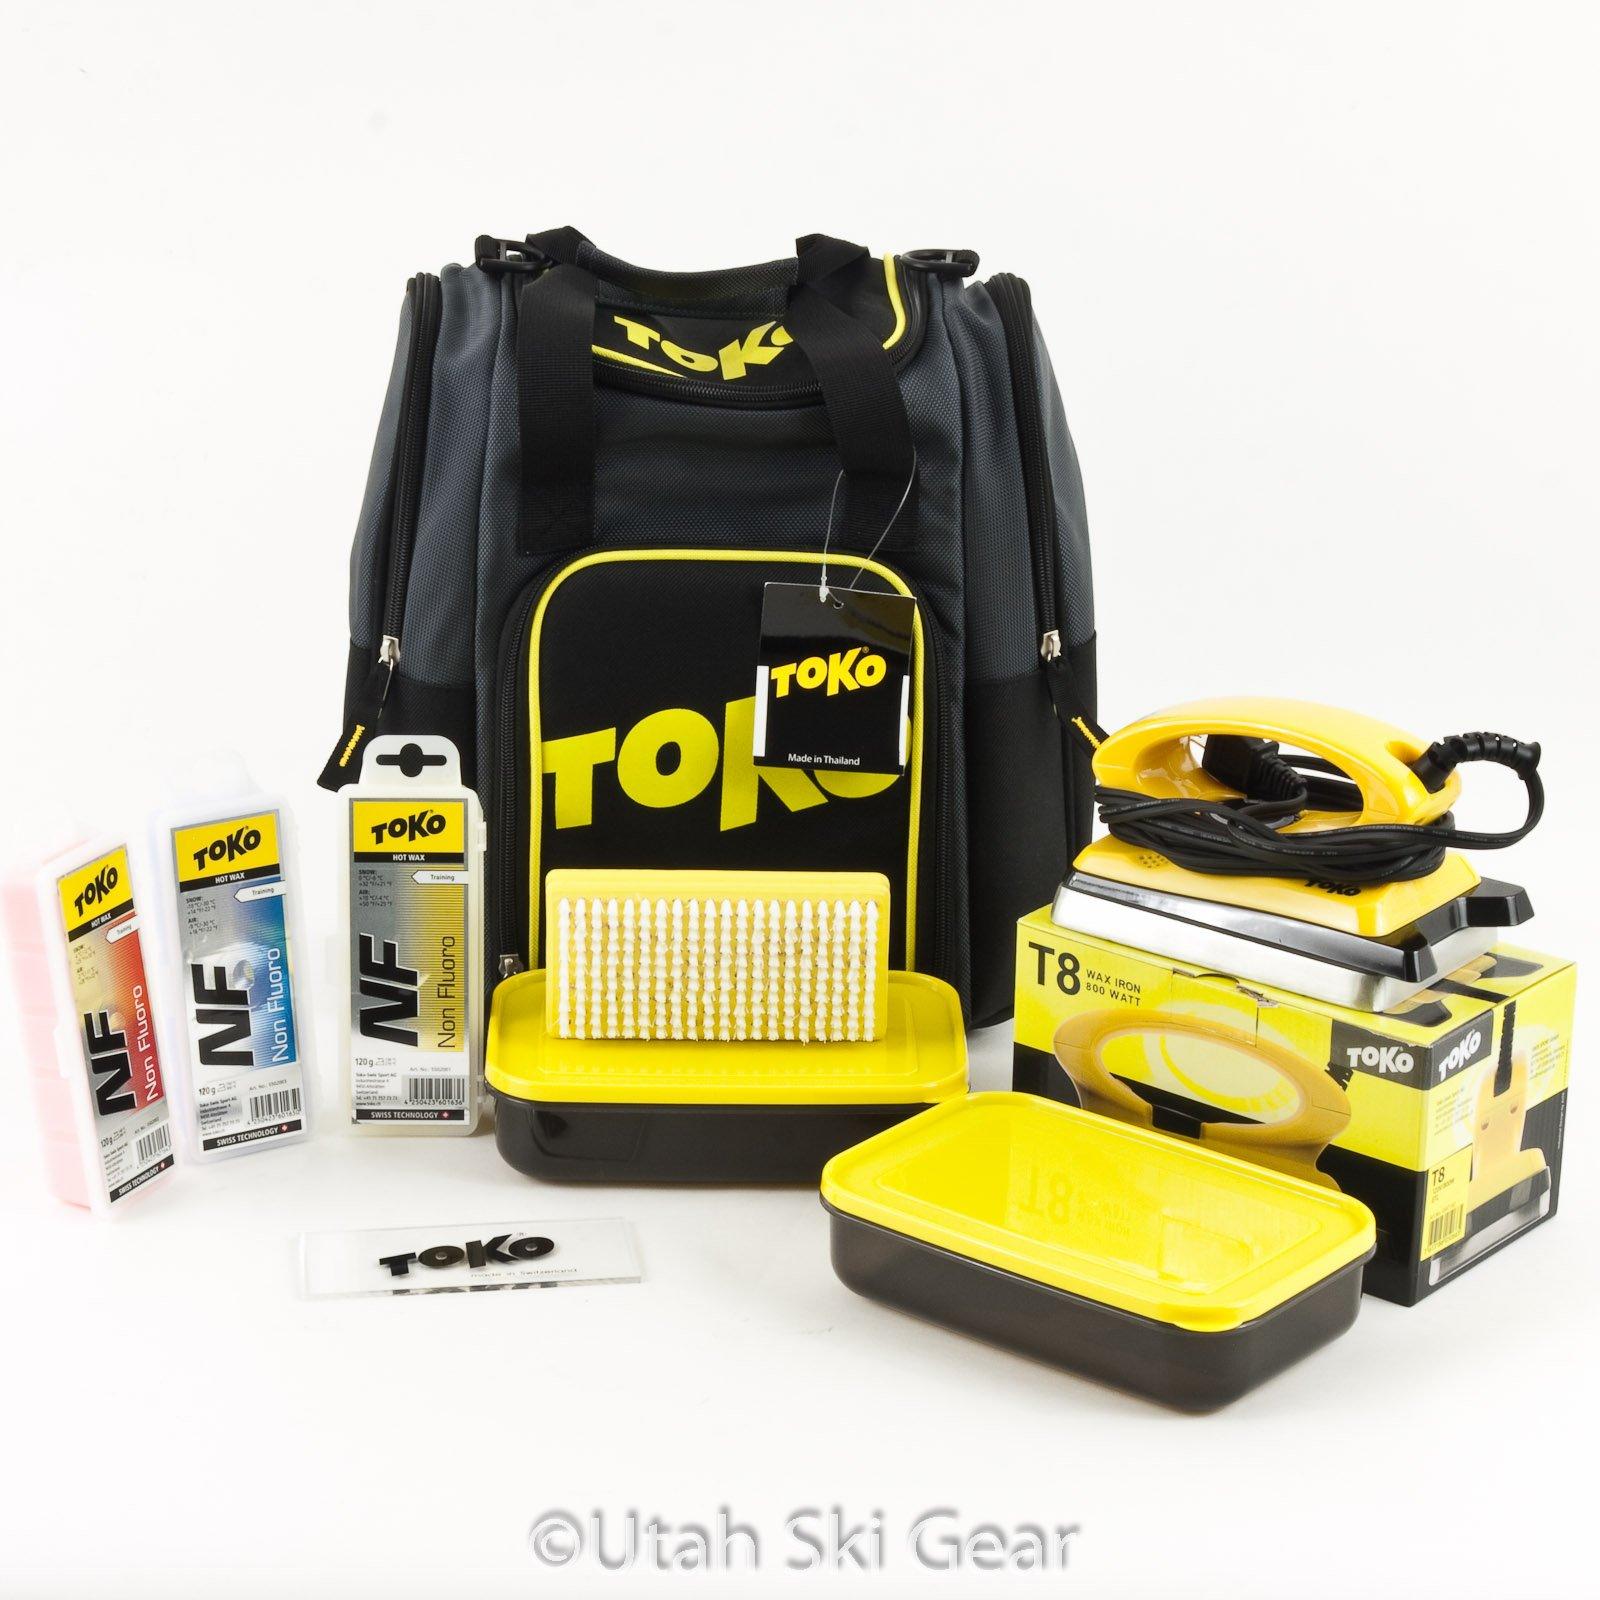 Toko NF Wax Kit with Soft Box